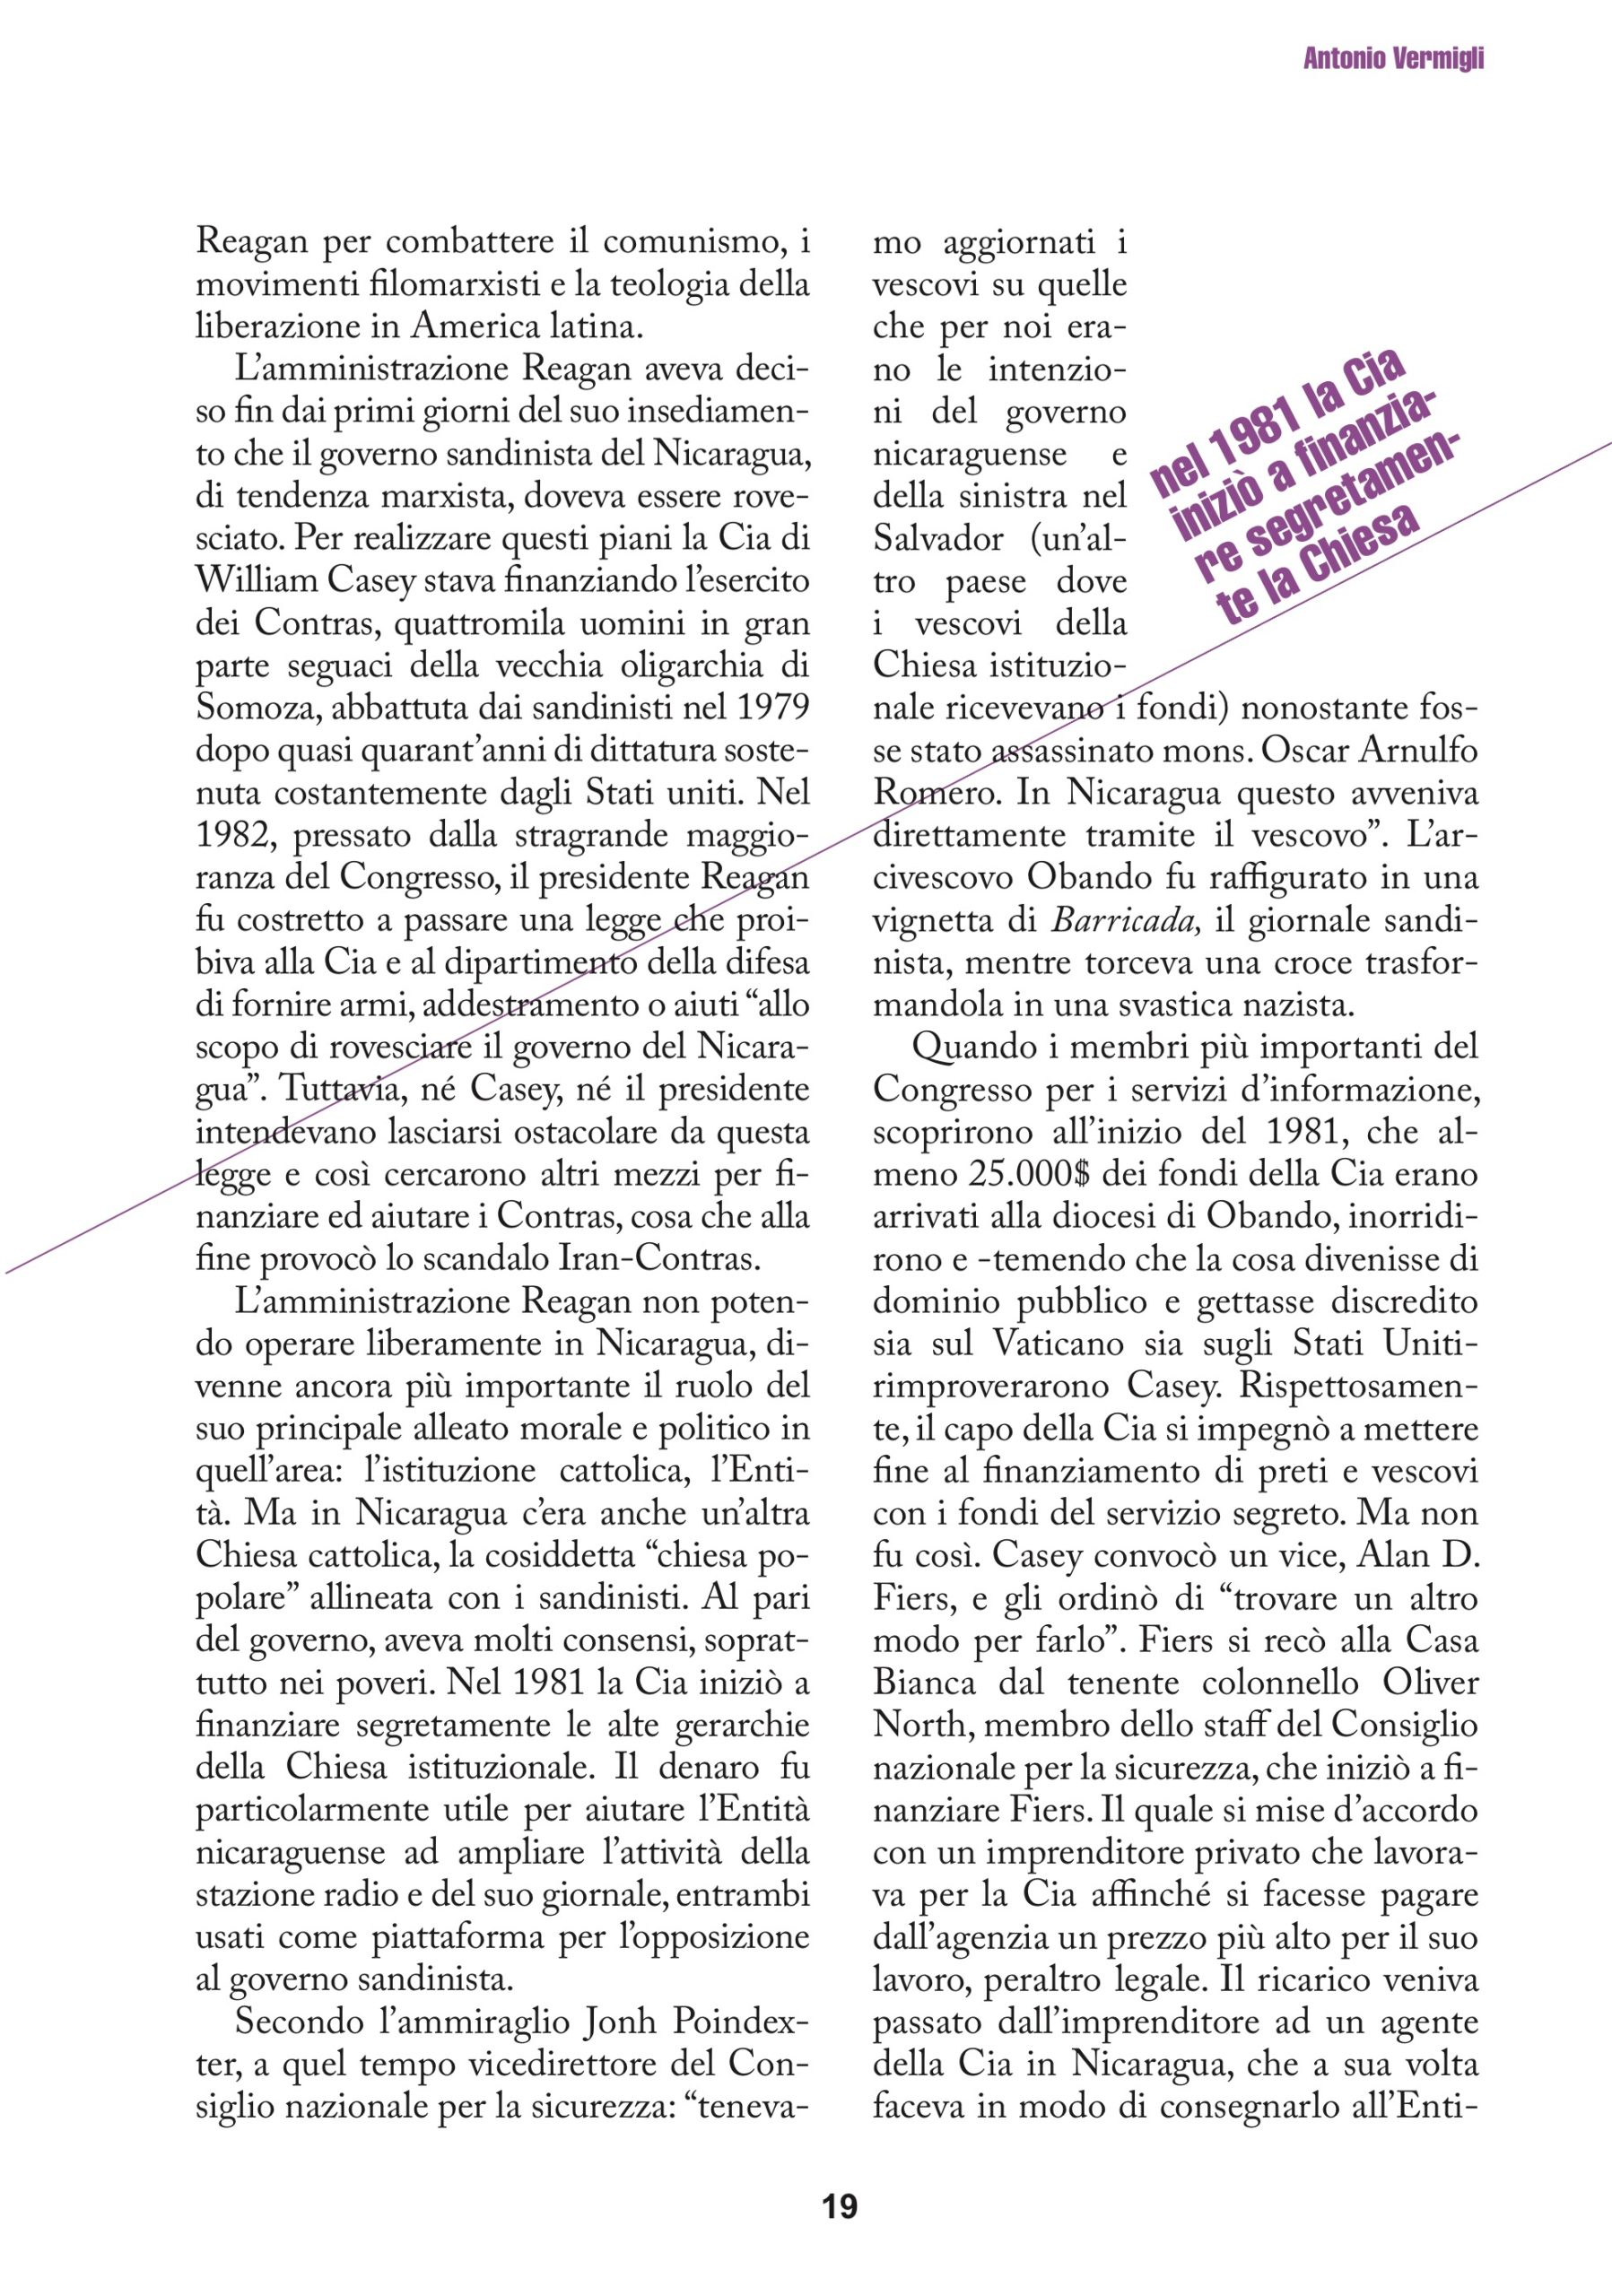 Vermigli GPII páginas 13 - 22-7